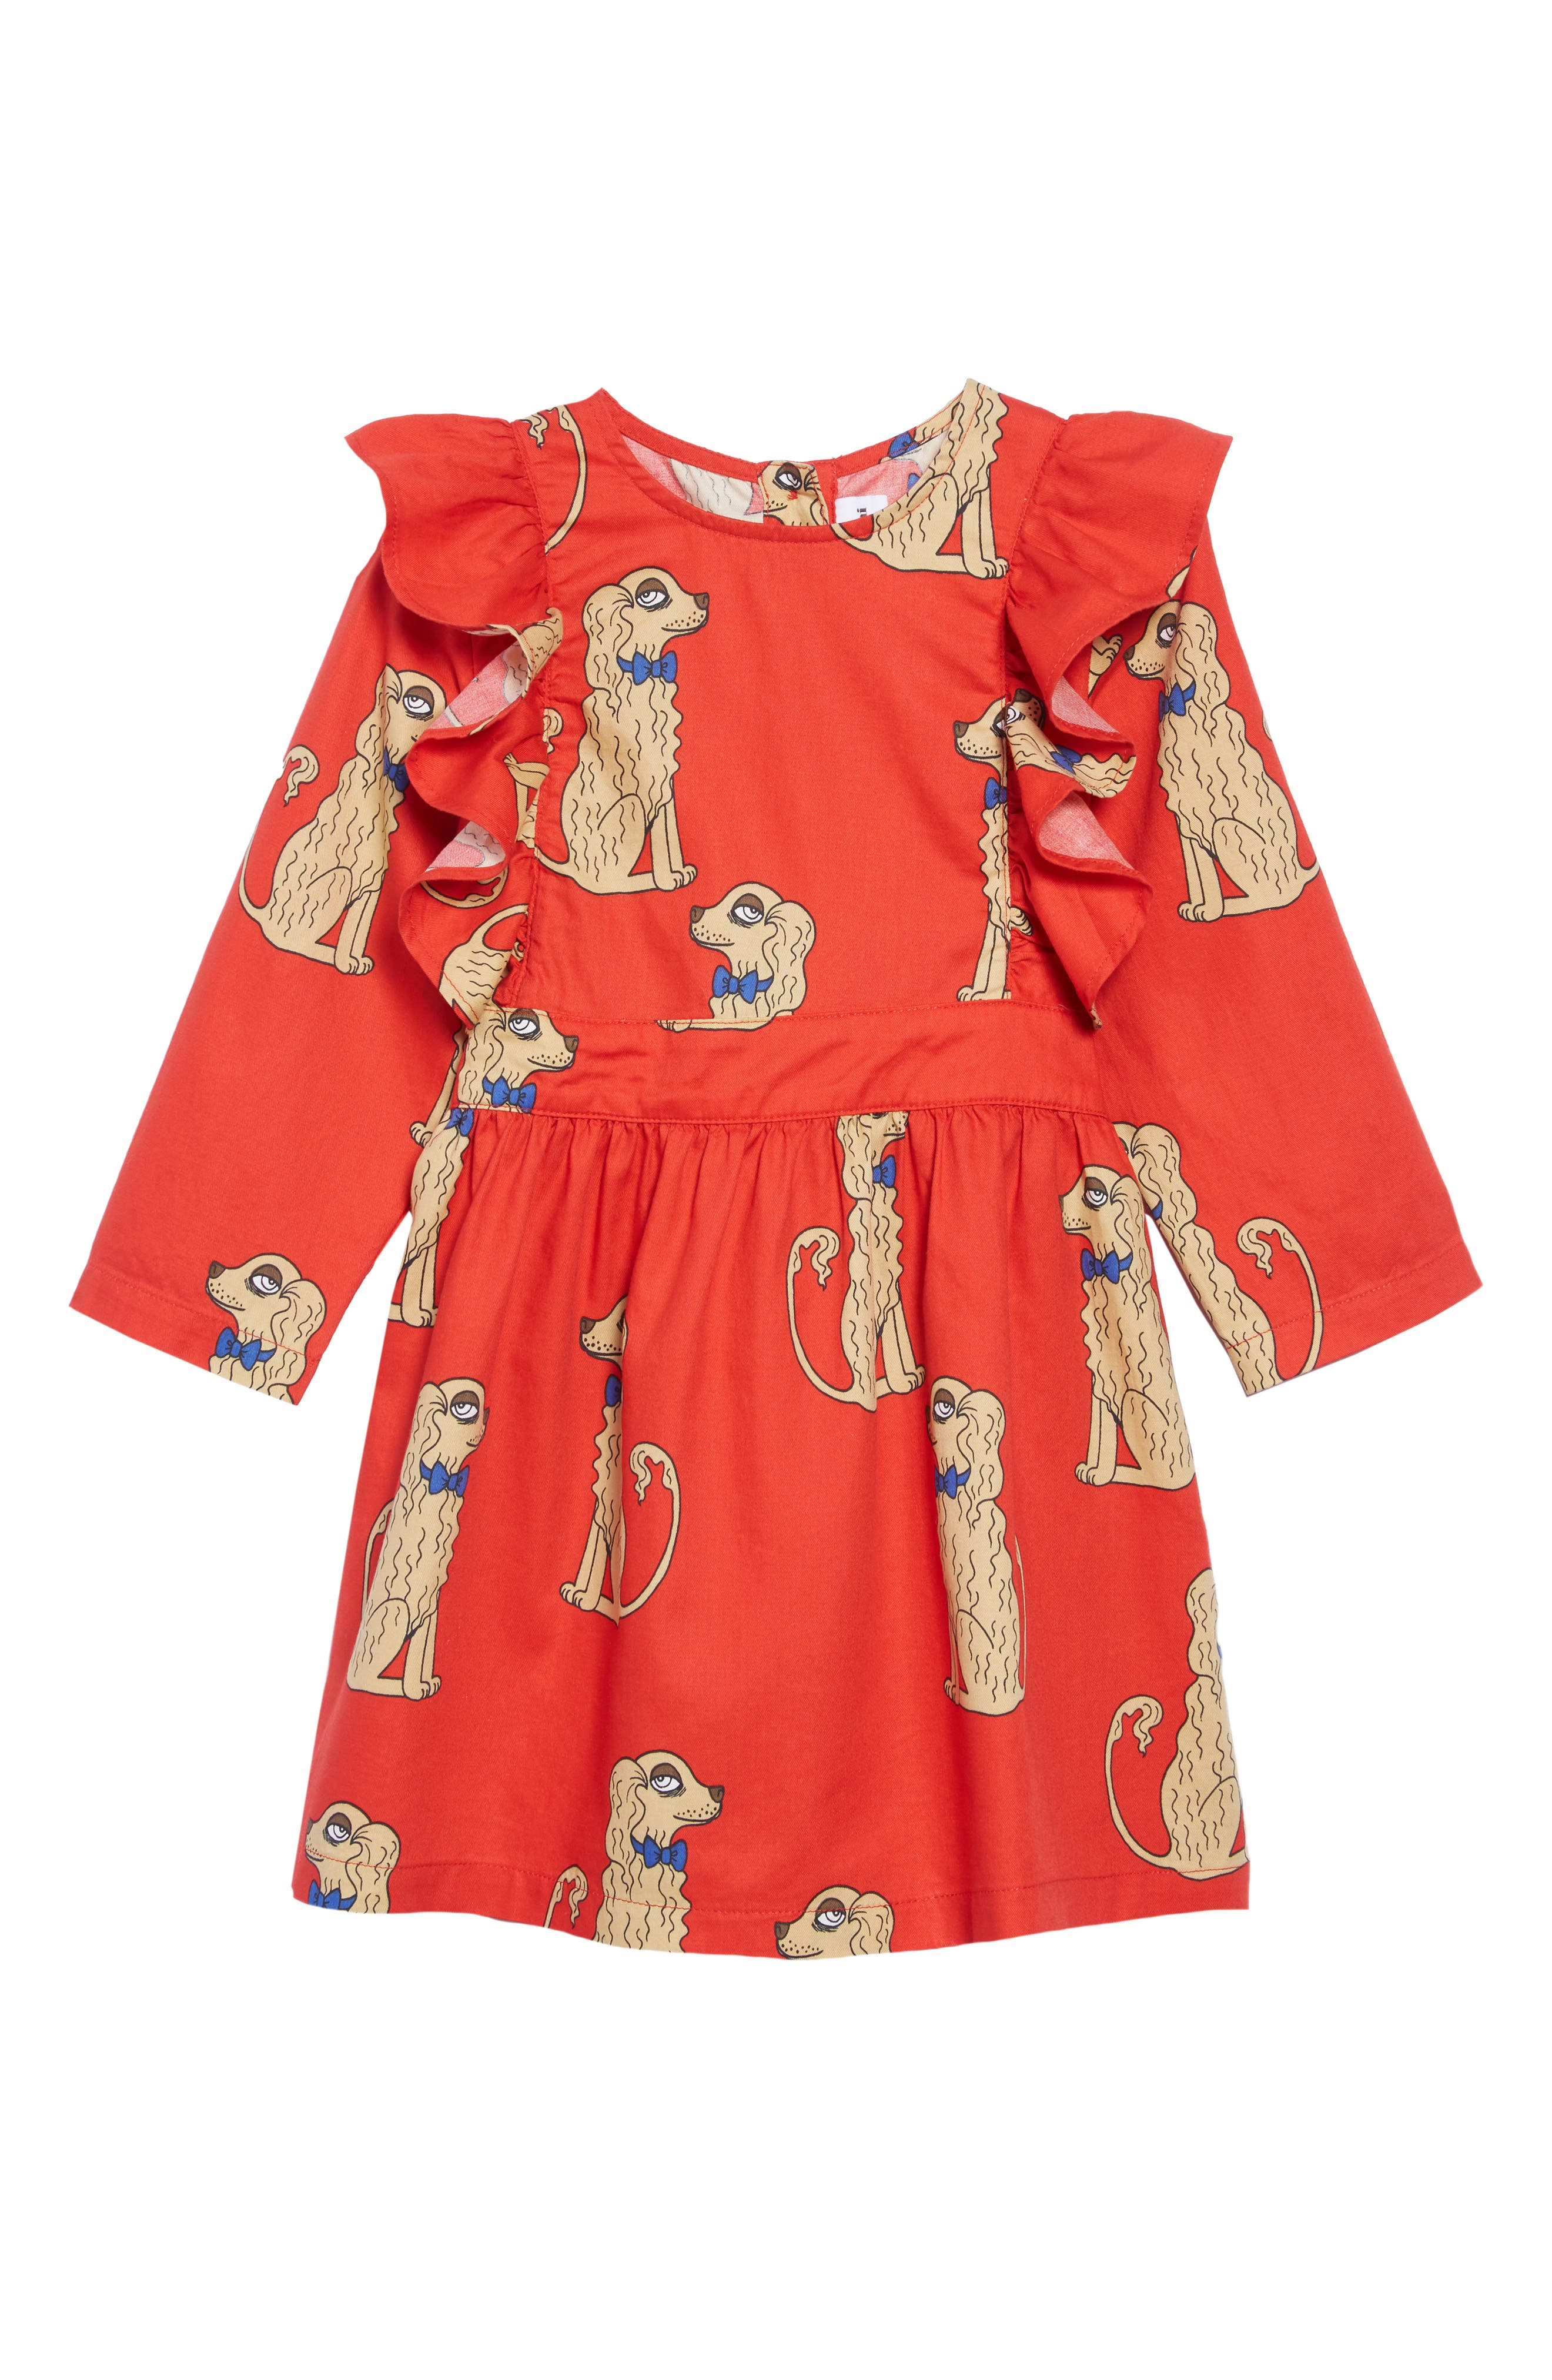 Spaniels Ruffle Dress,                             Main thumbnail 1, color,                             Red